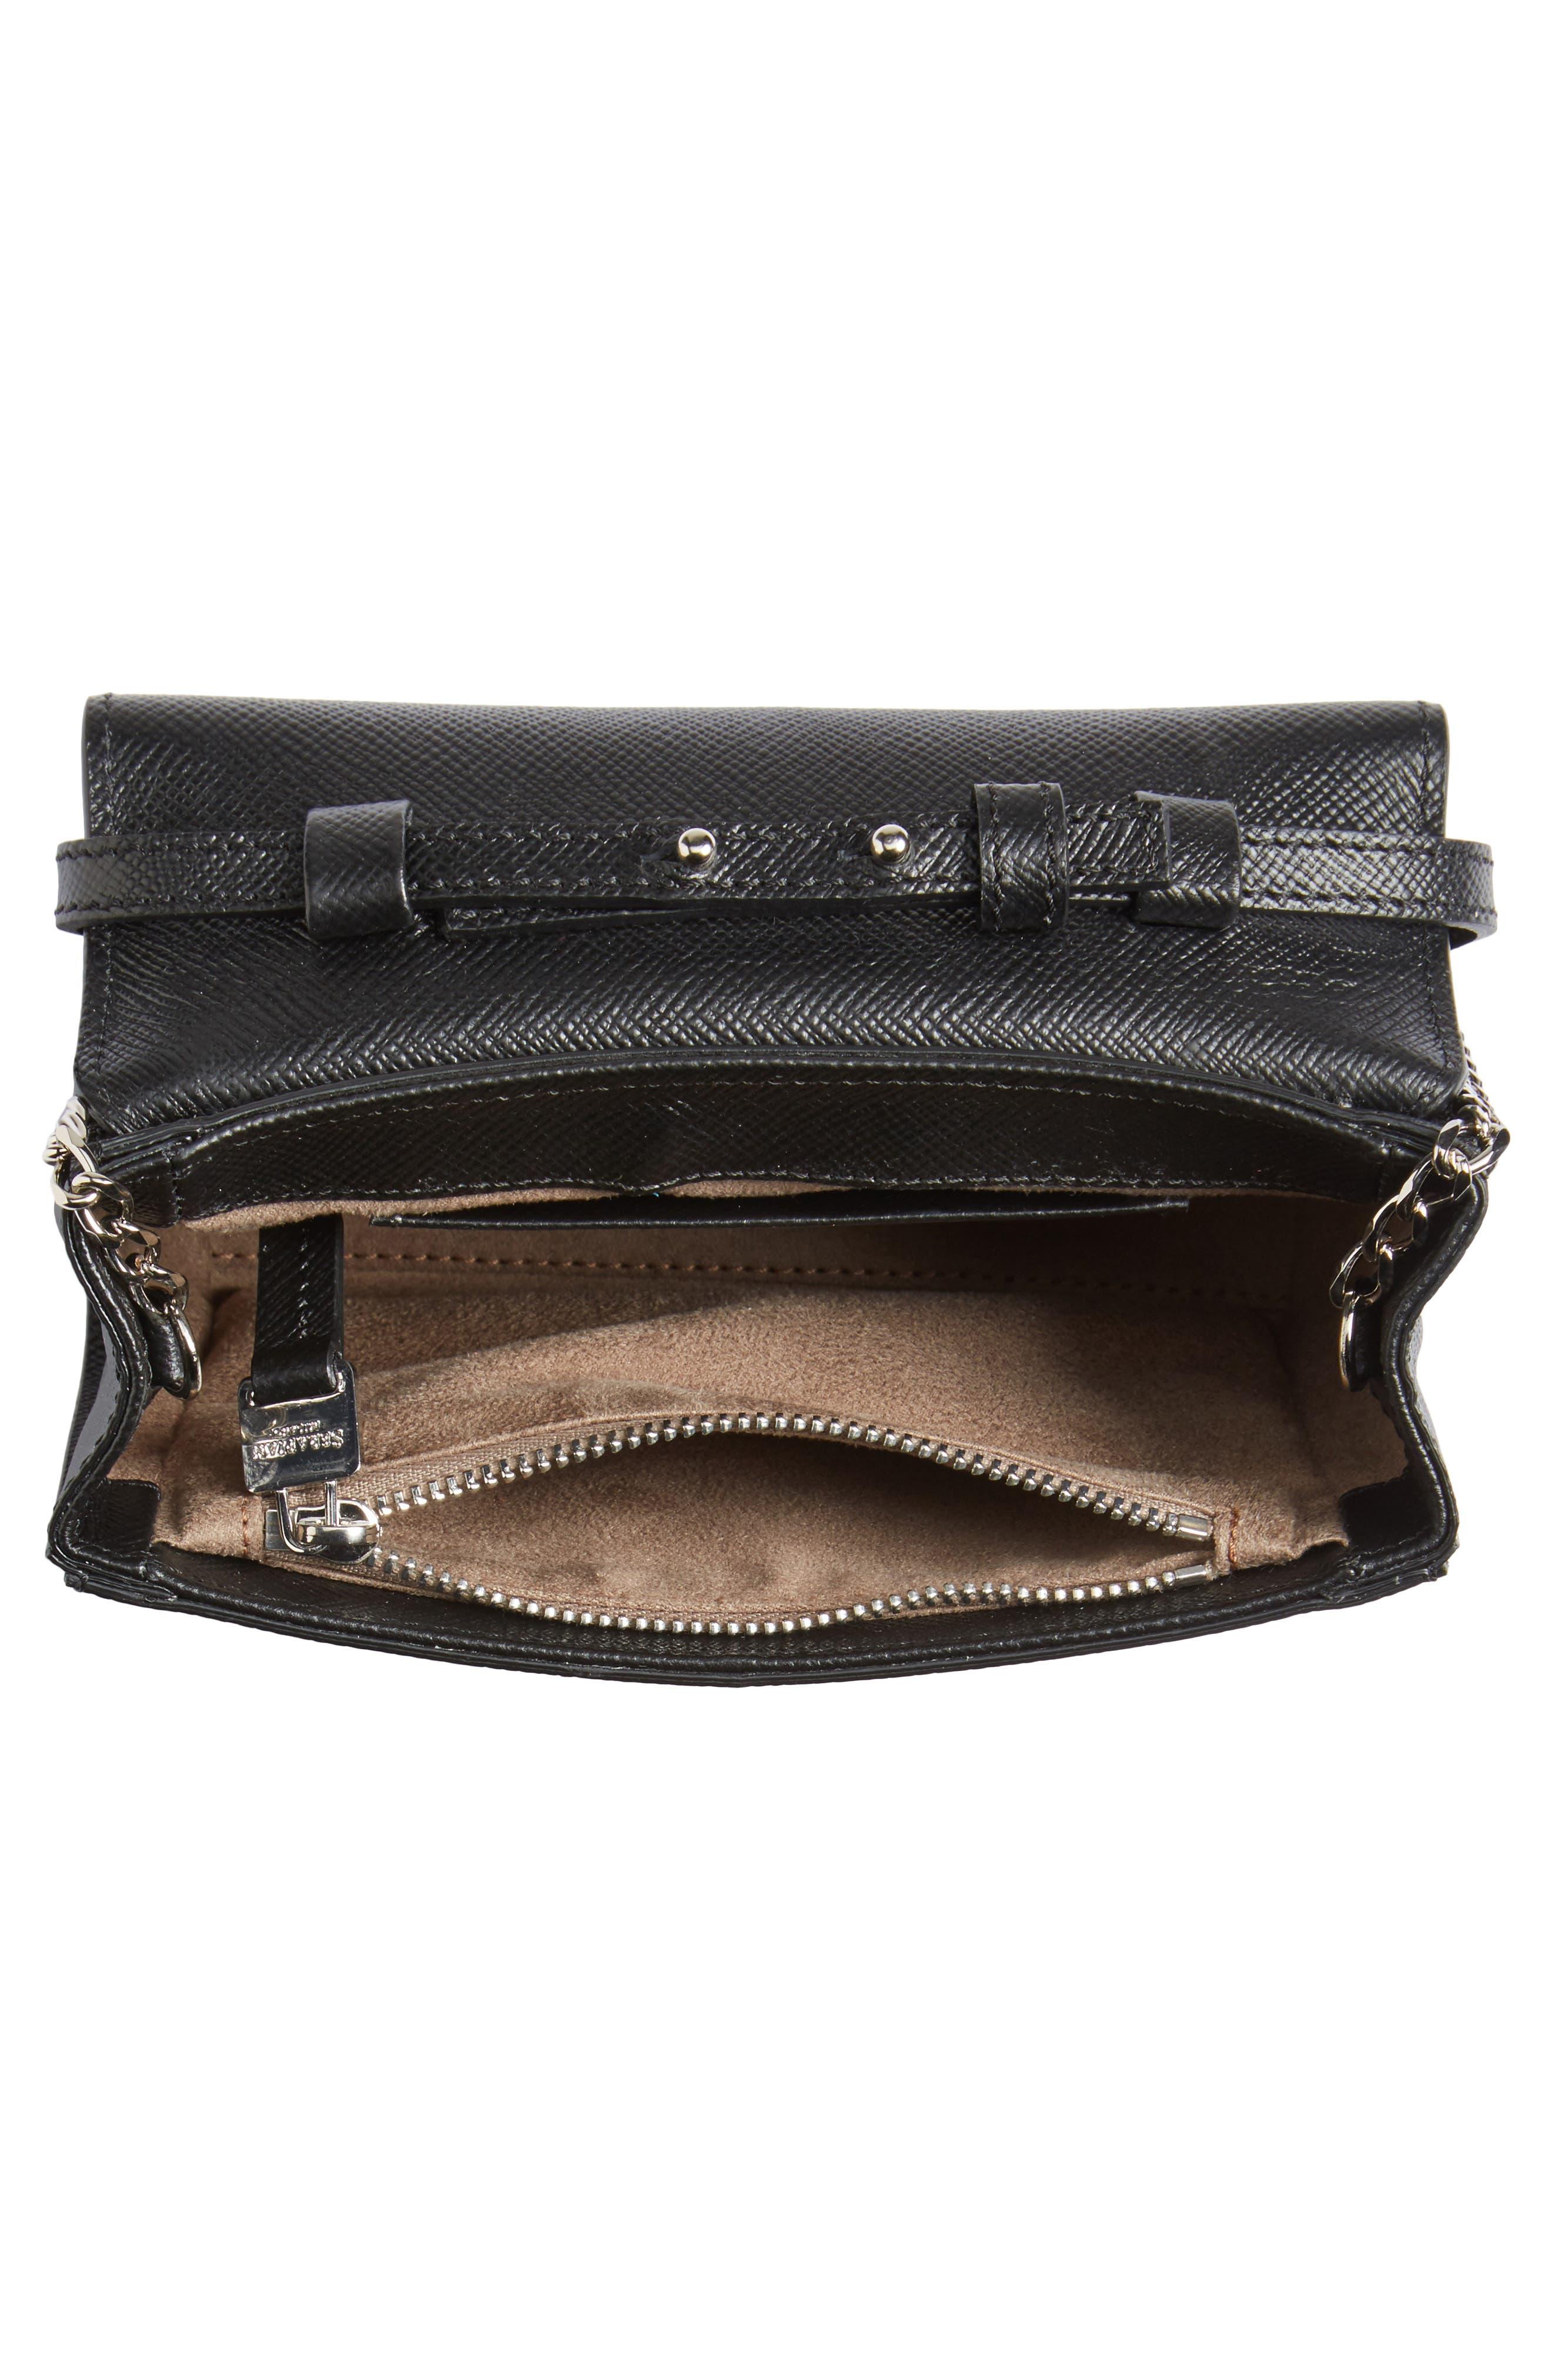 Mini Ilenea Leather Crossbody Bag,                             Alternate thumbnail 5, color,                             001